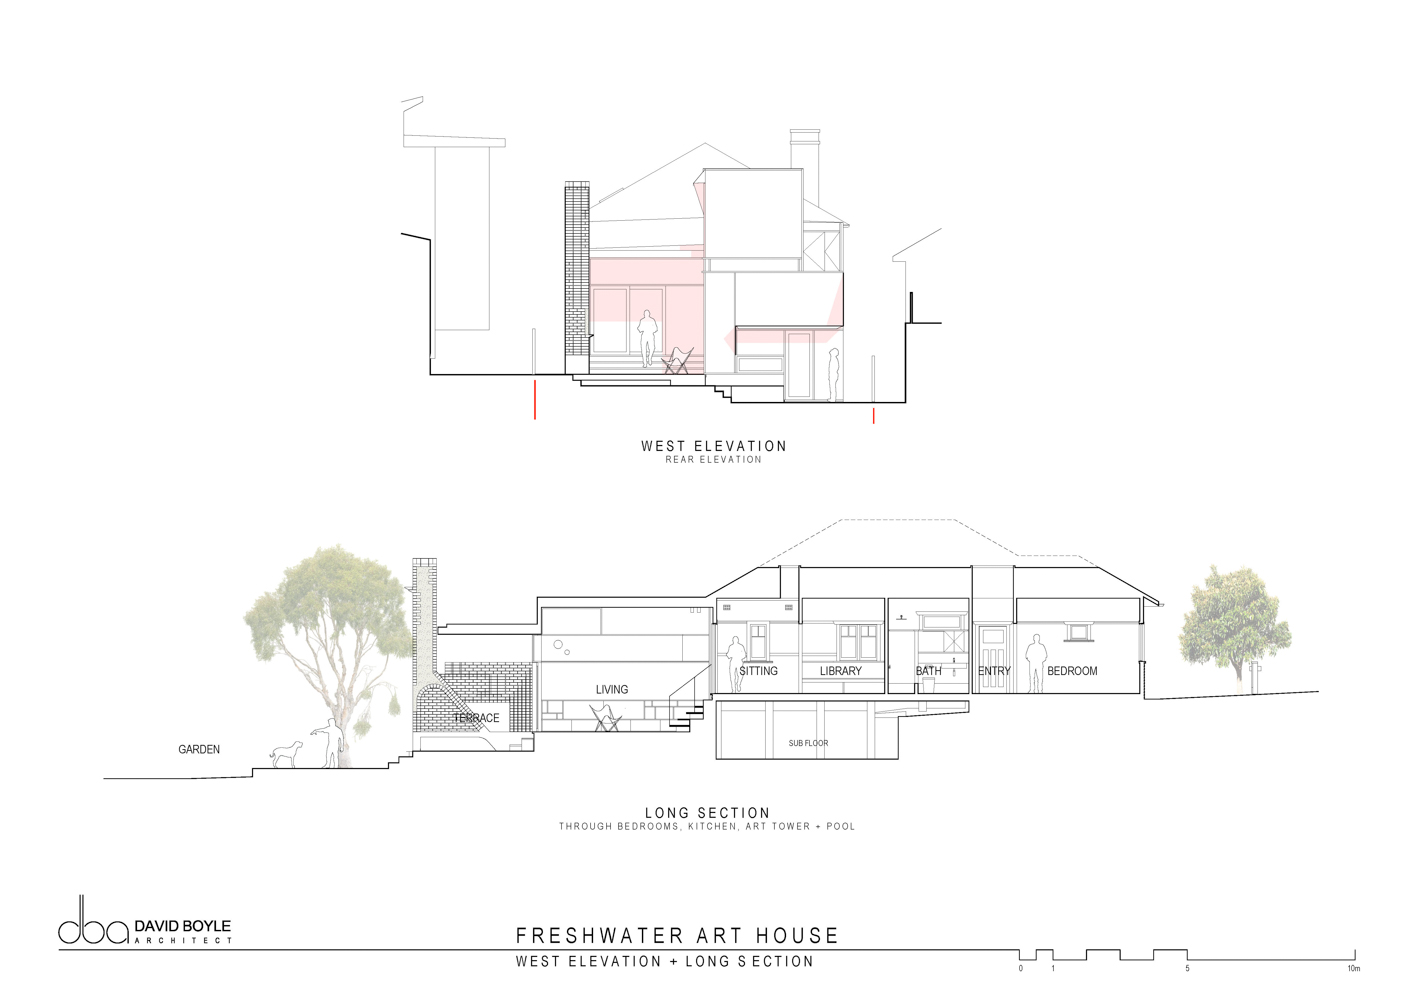 freshwater-art-house-david-boyle-architect-australian-architecture-the-design-emotive-23.jpg